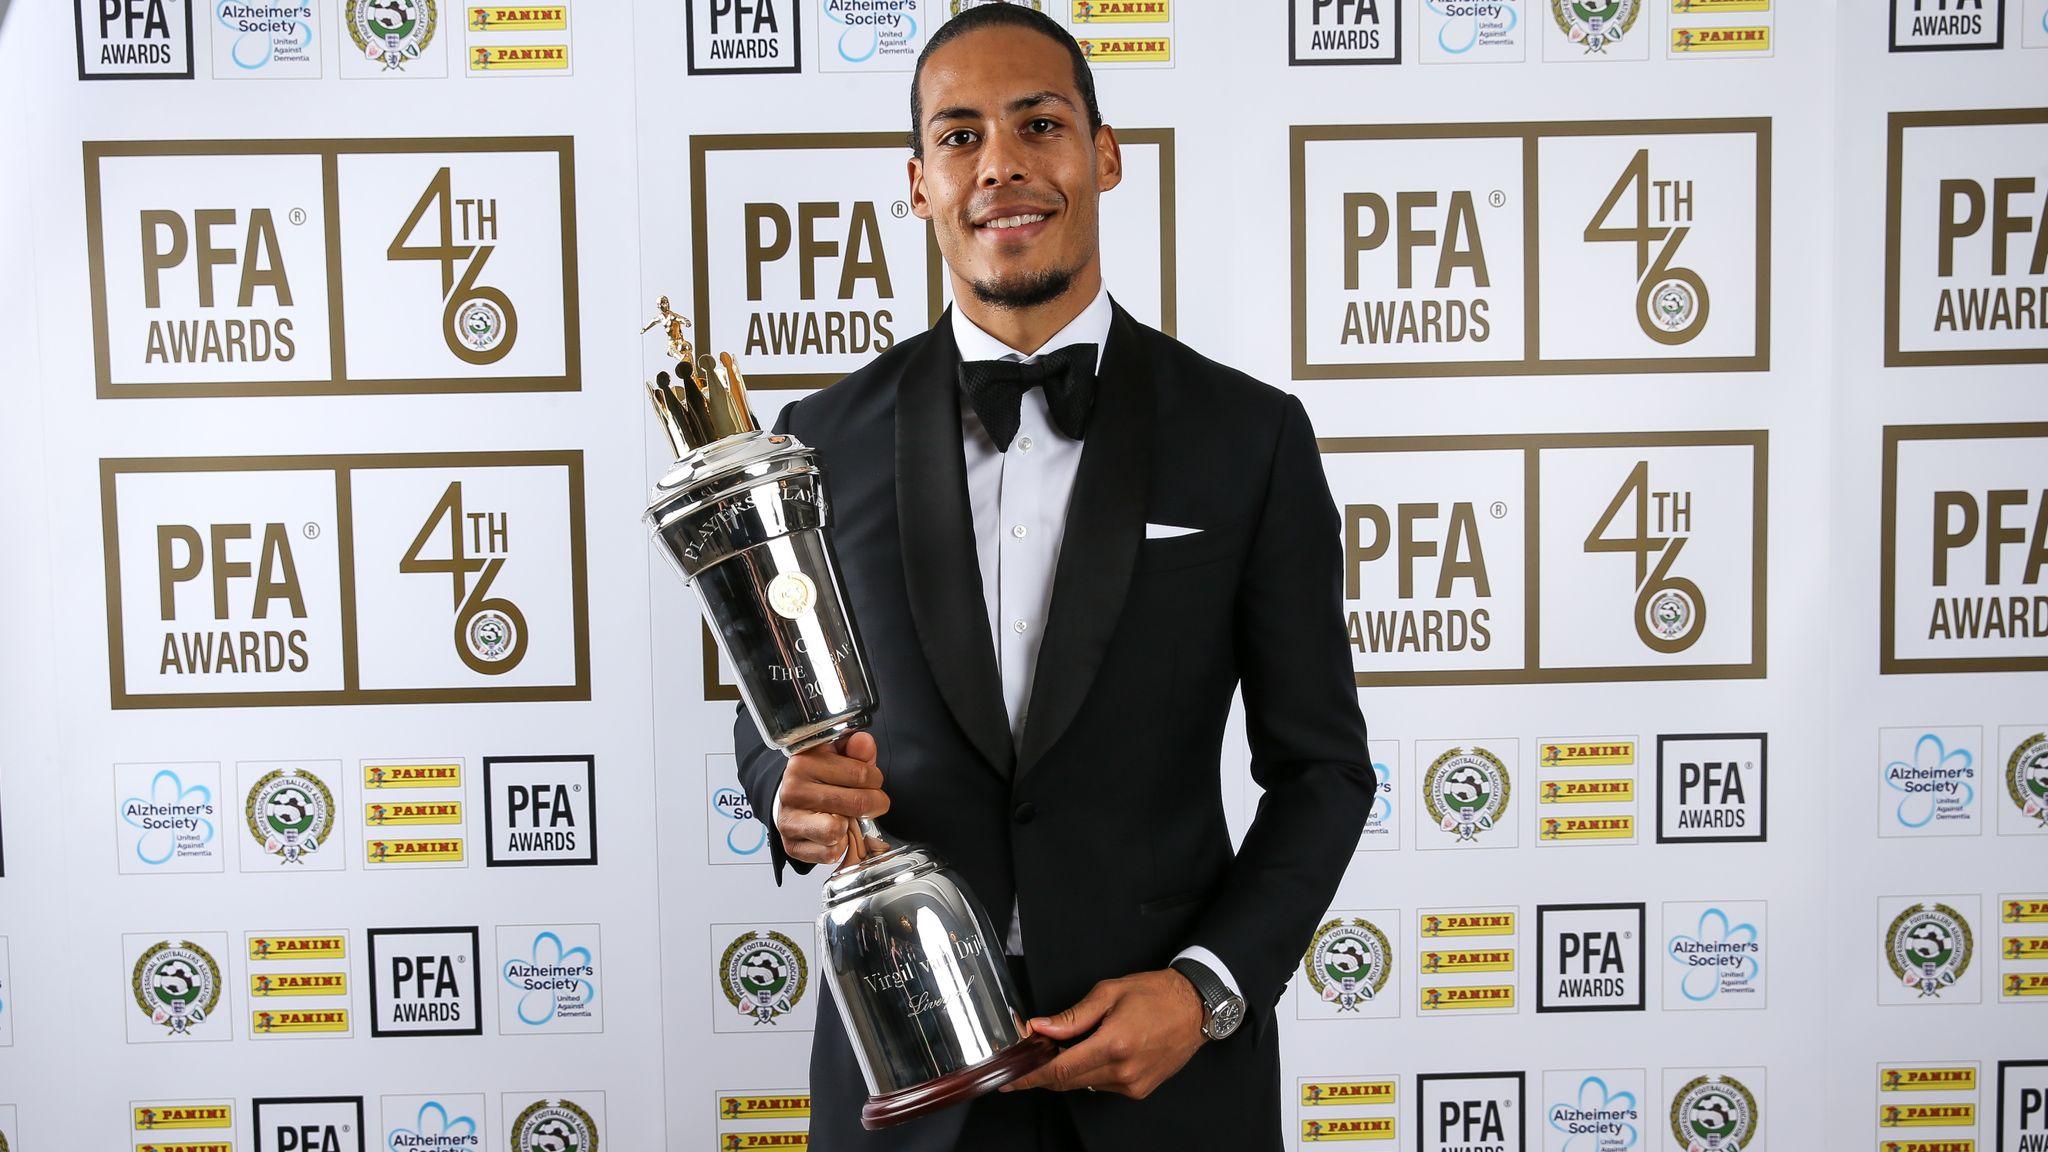 Virgil Van Dijk And Raheem Sterling Win Pfa Player Of The Year Awards Football News Sky Sports